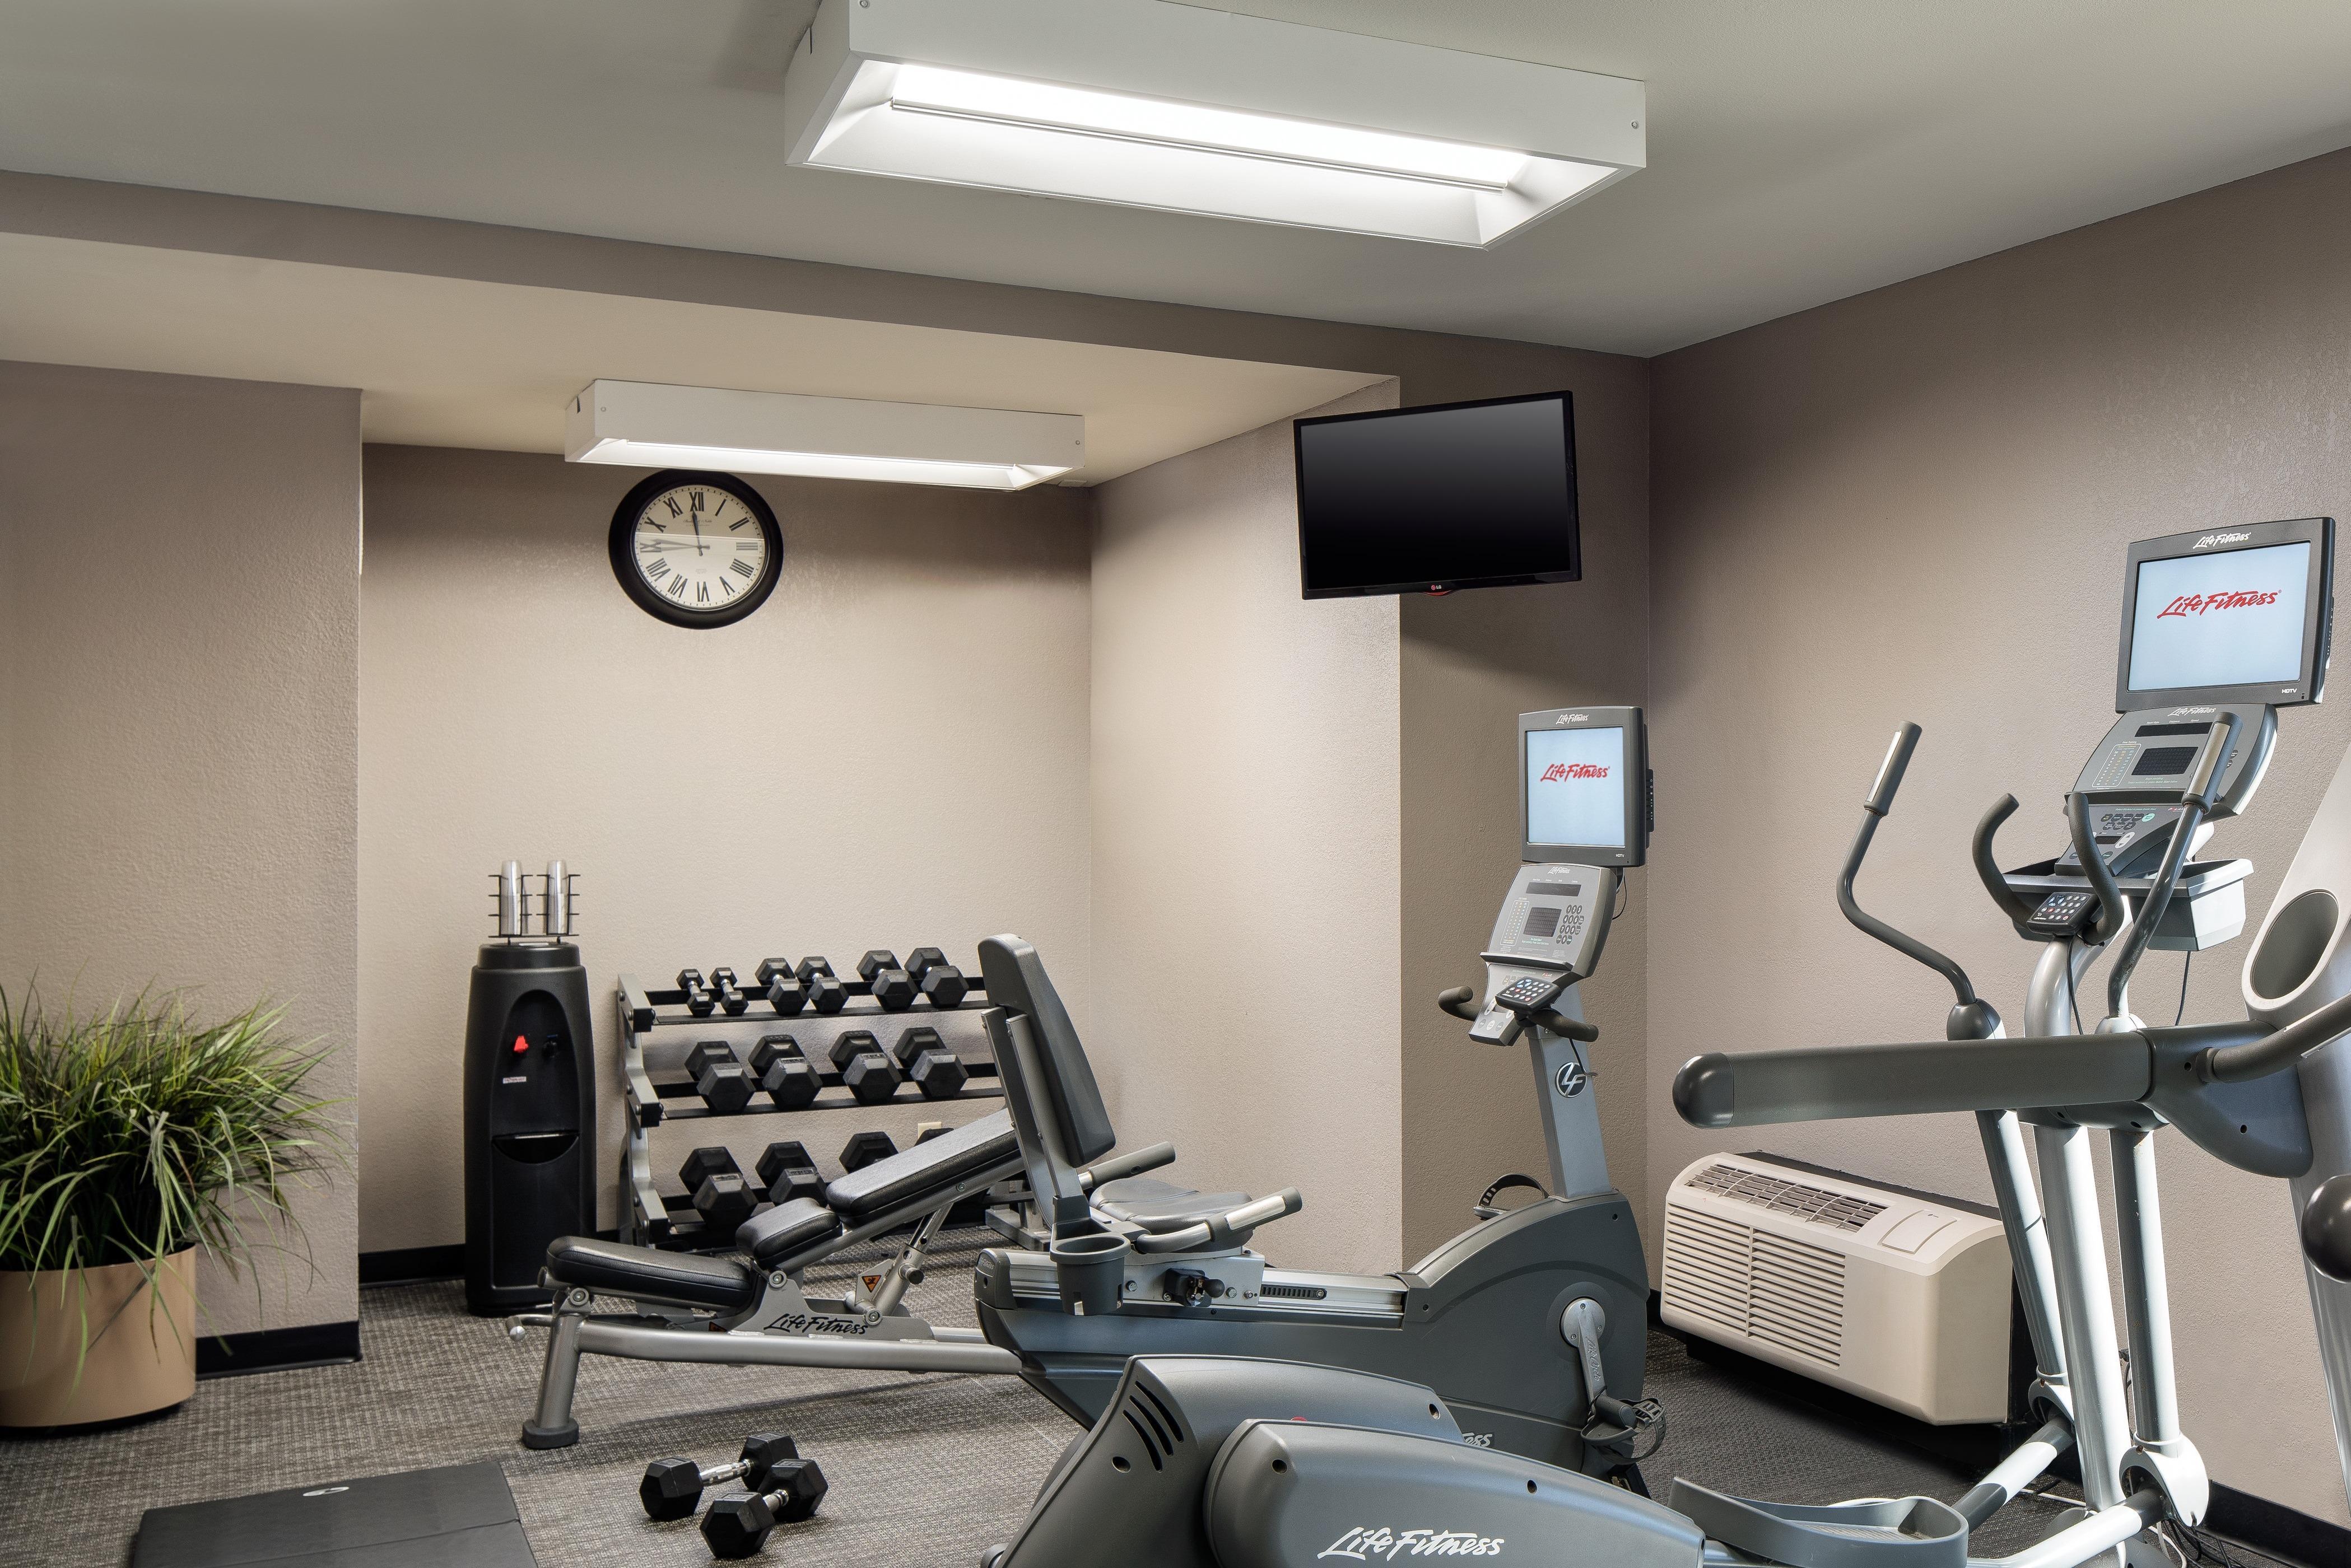 Courtyard Irvine John Wayne Airport/Orange County Fitness Center